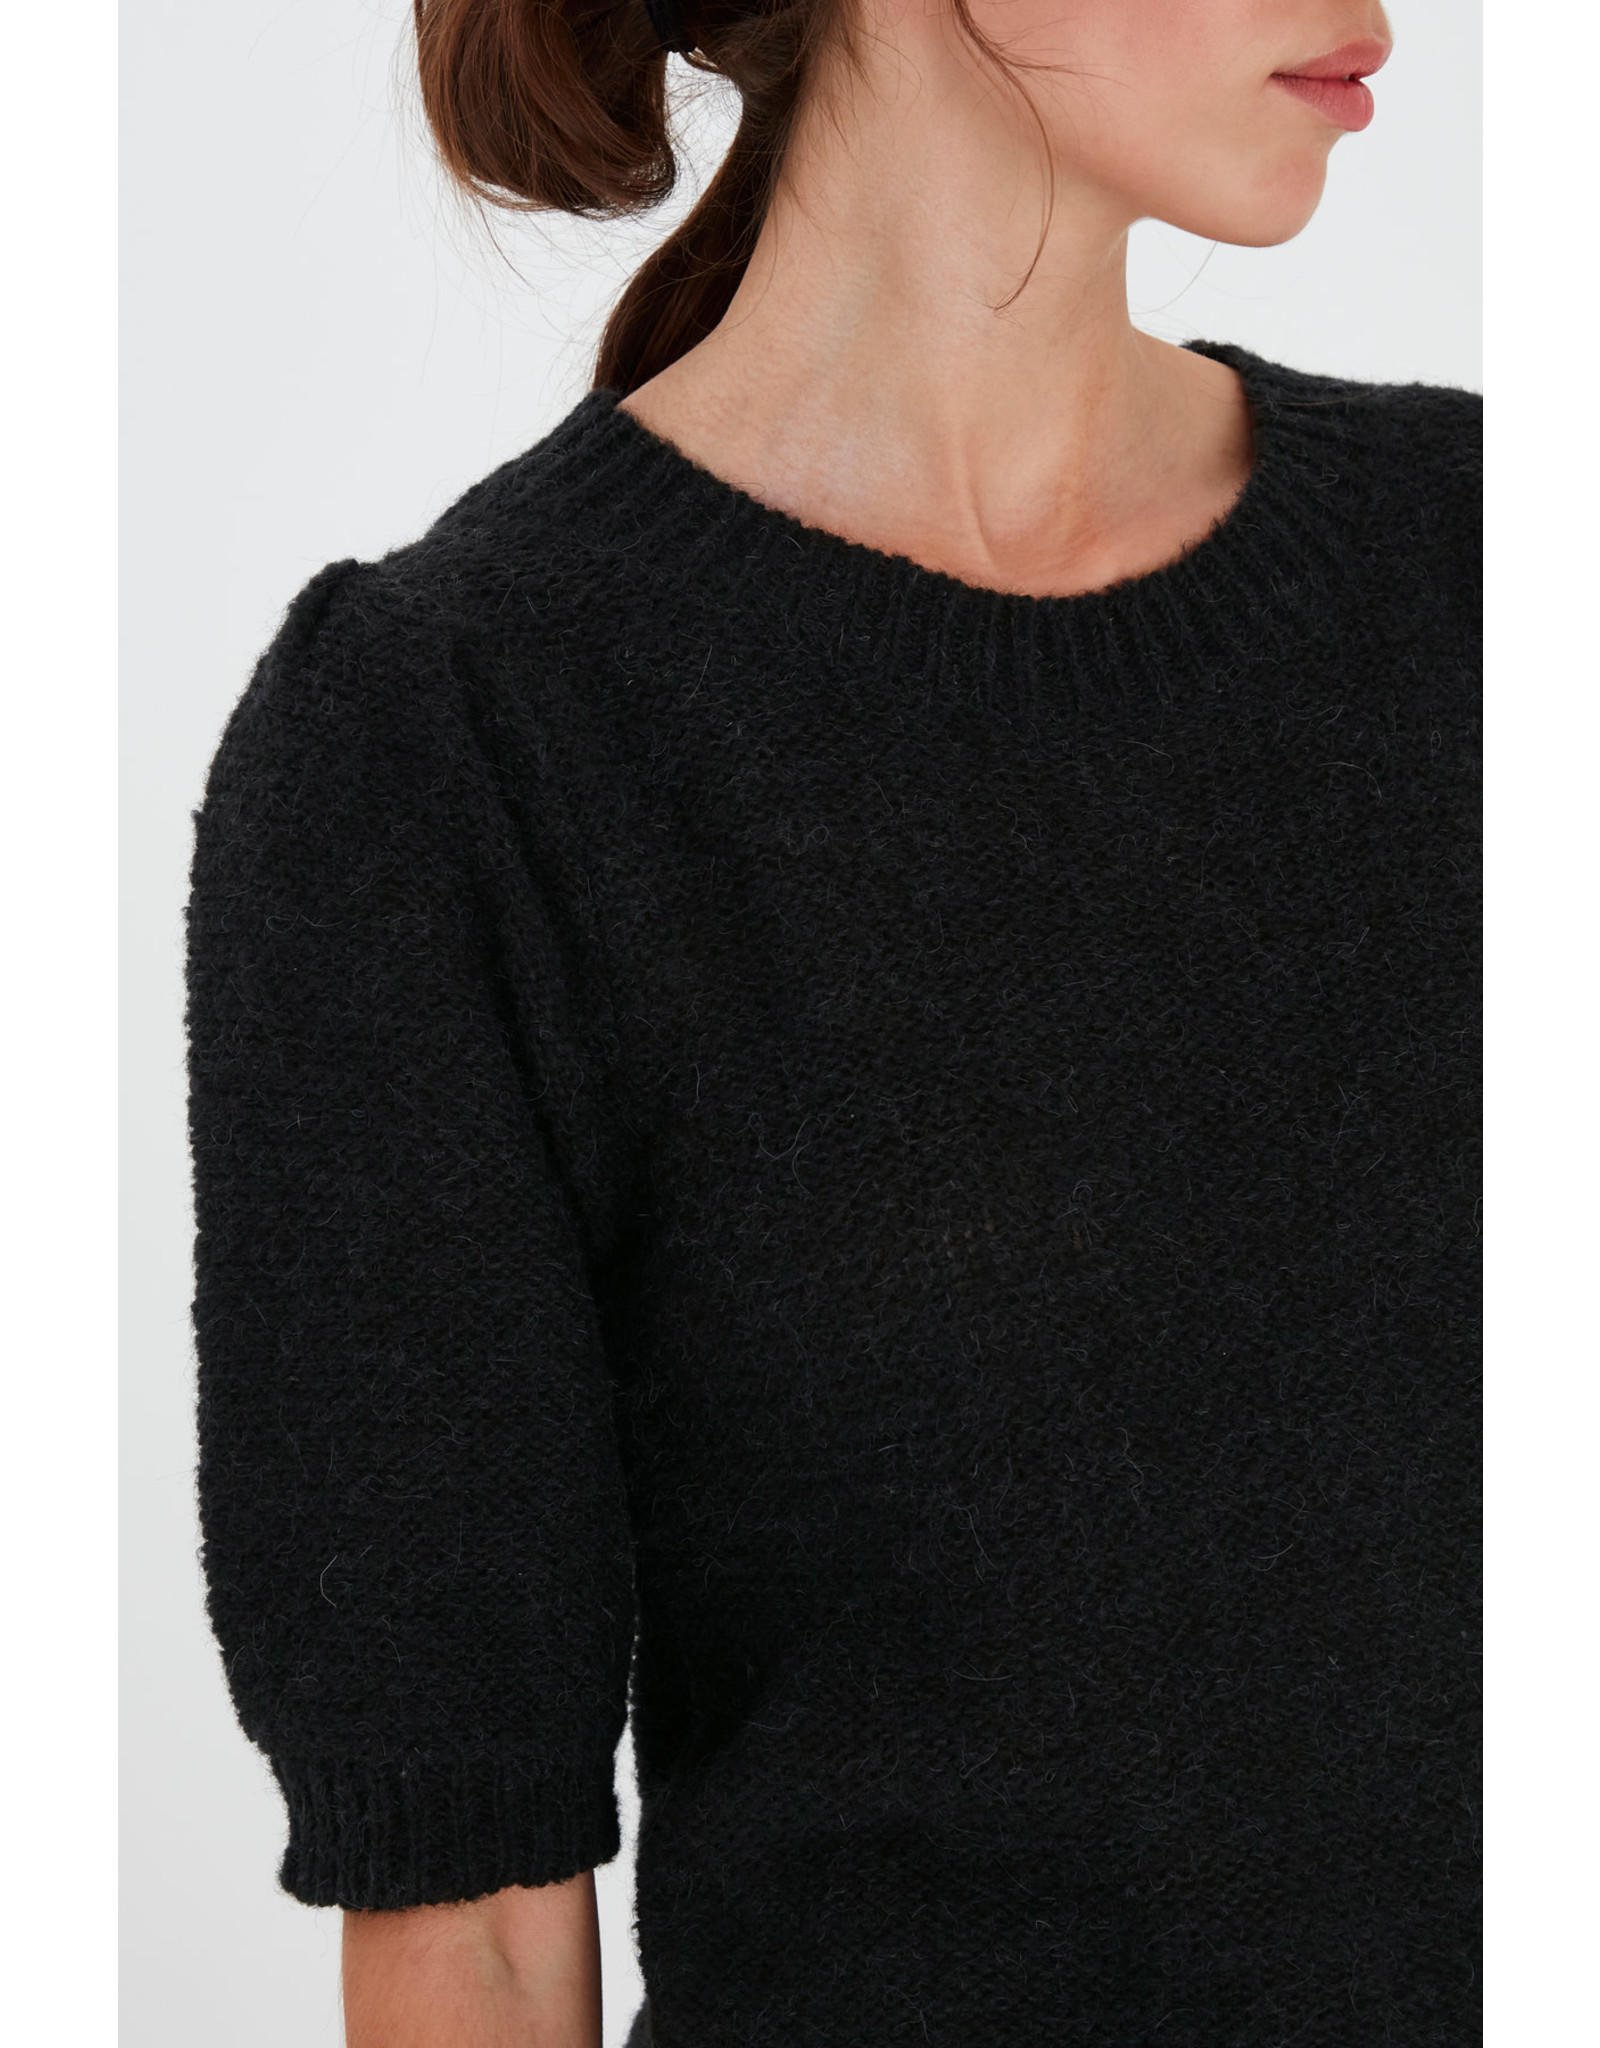 IDK - Cool Sweater